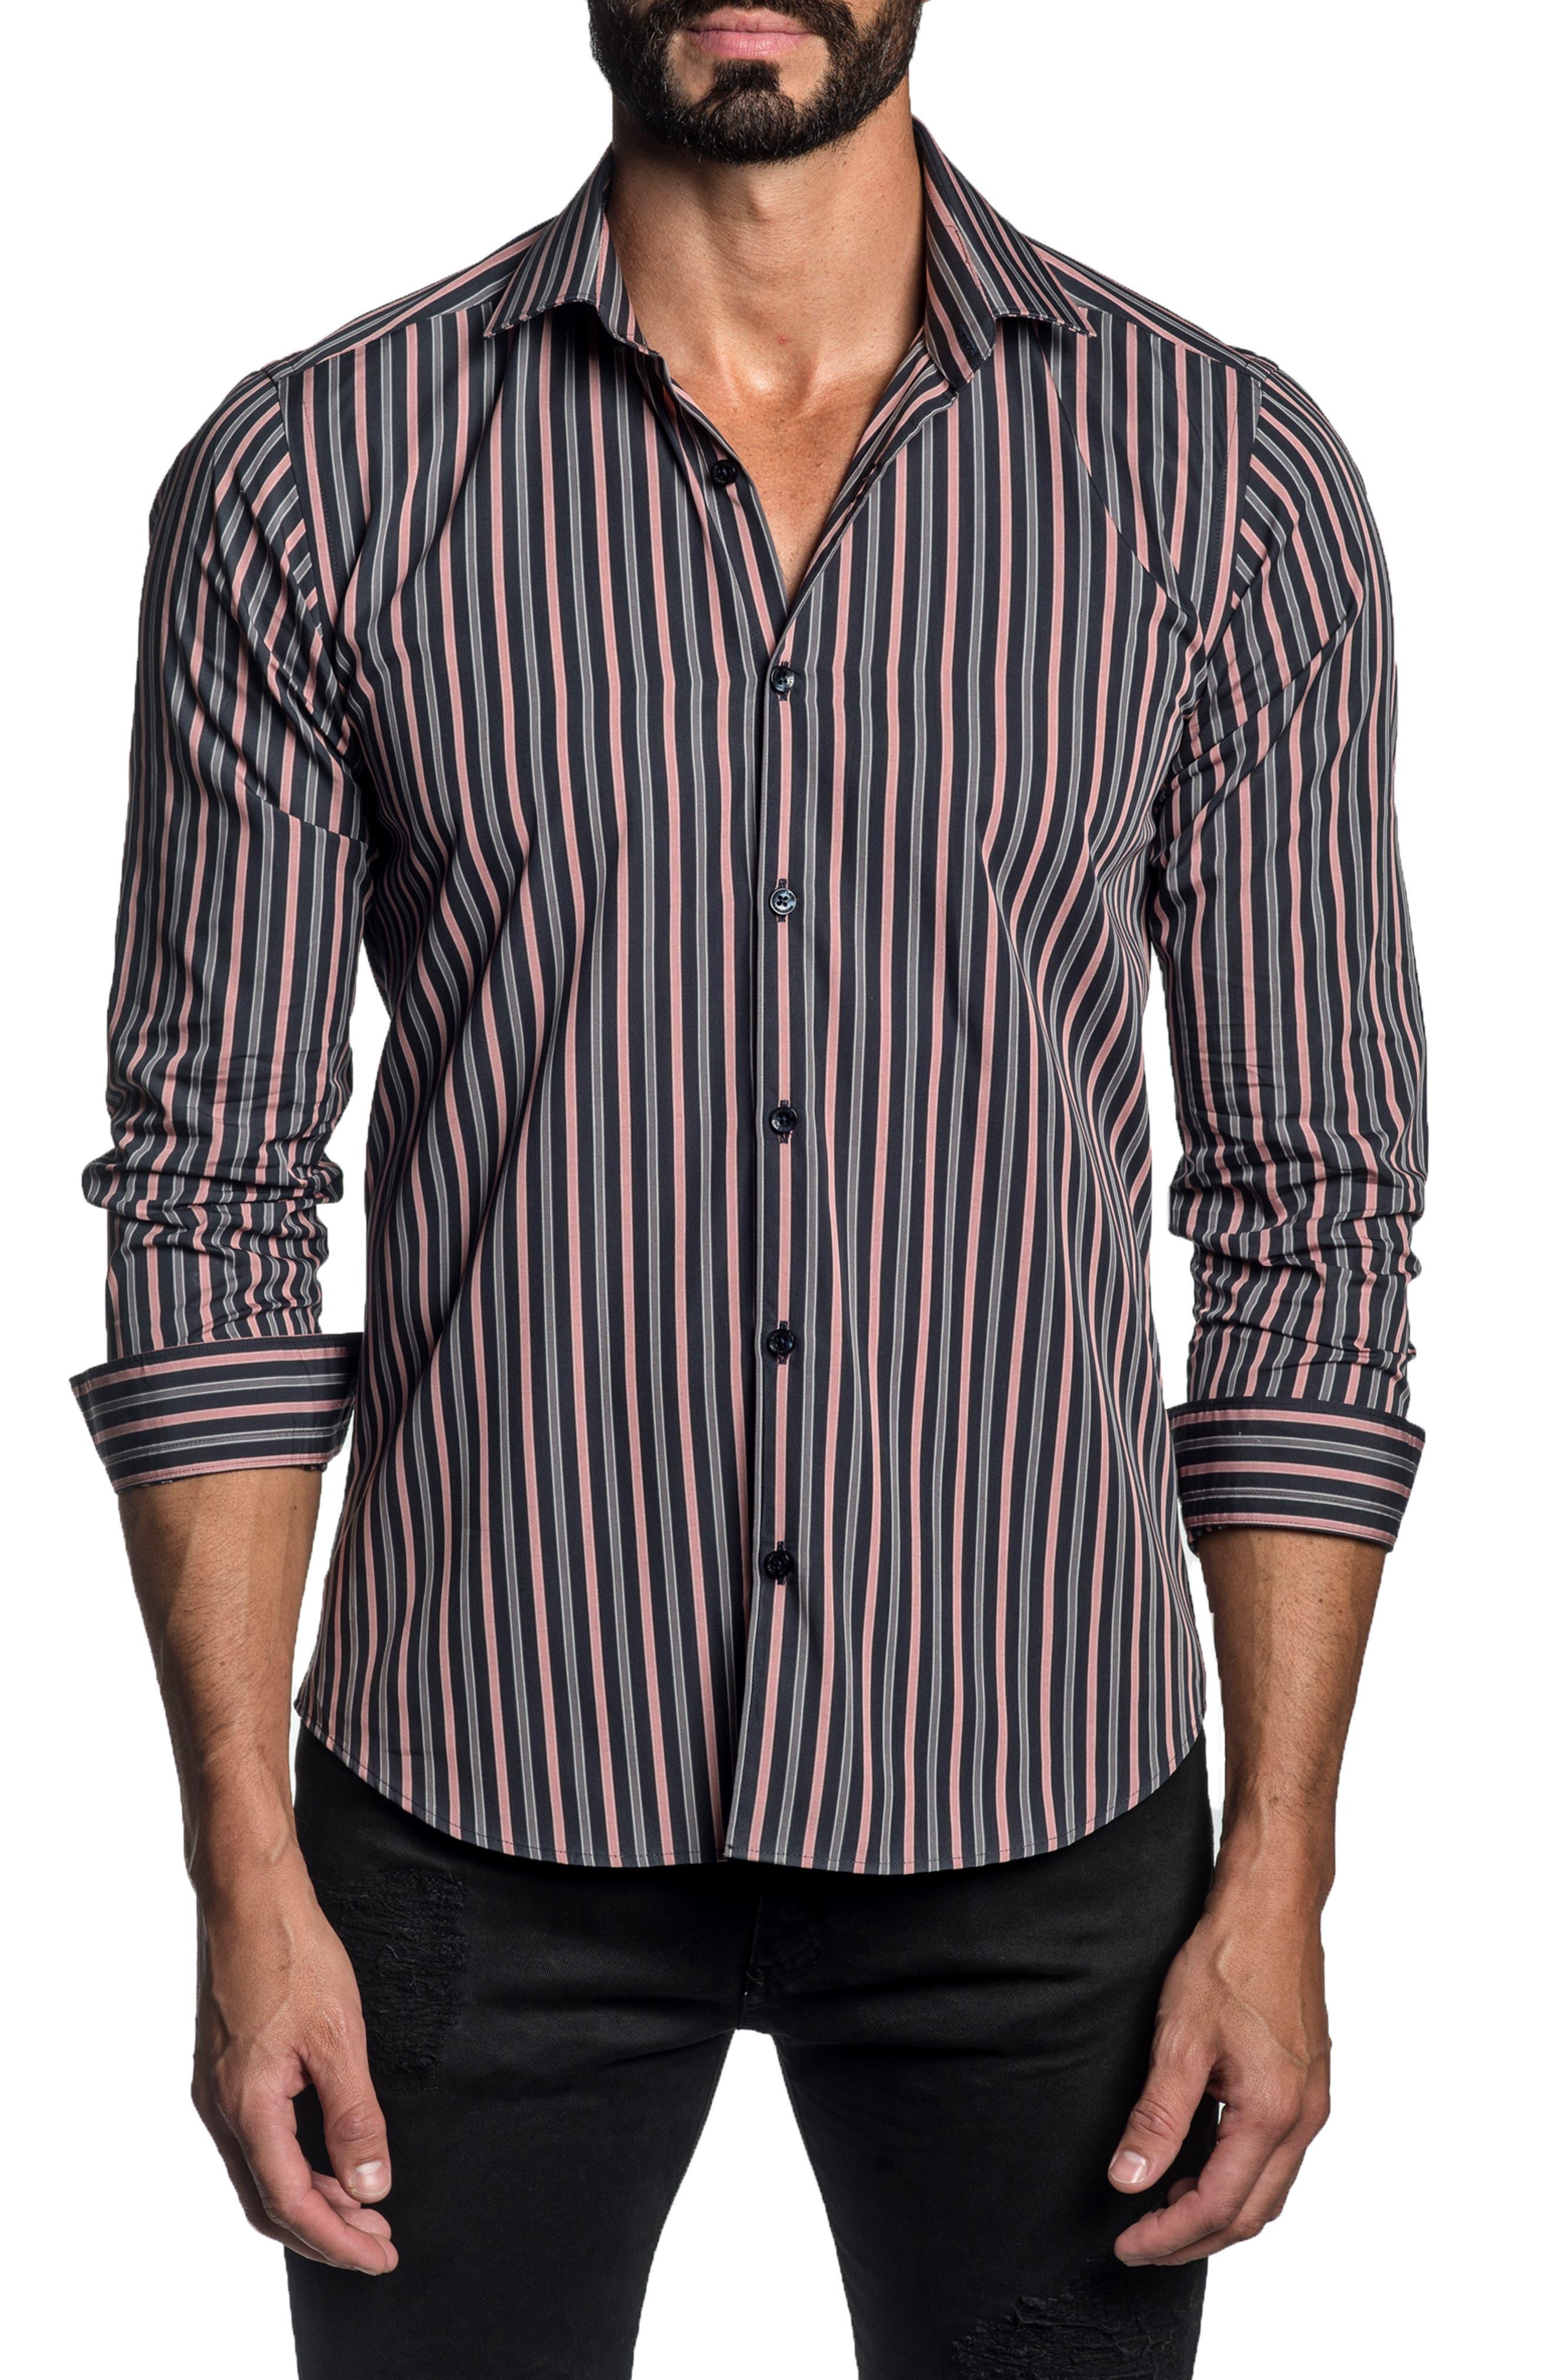 Men's Mens Long Sleeve Shirt